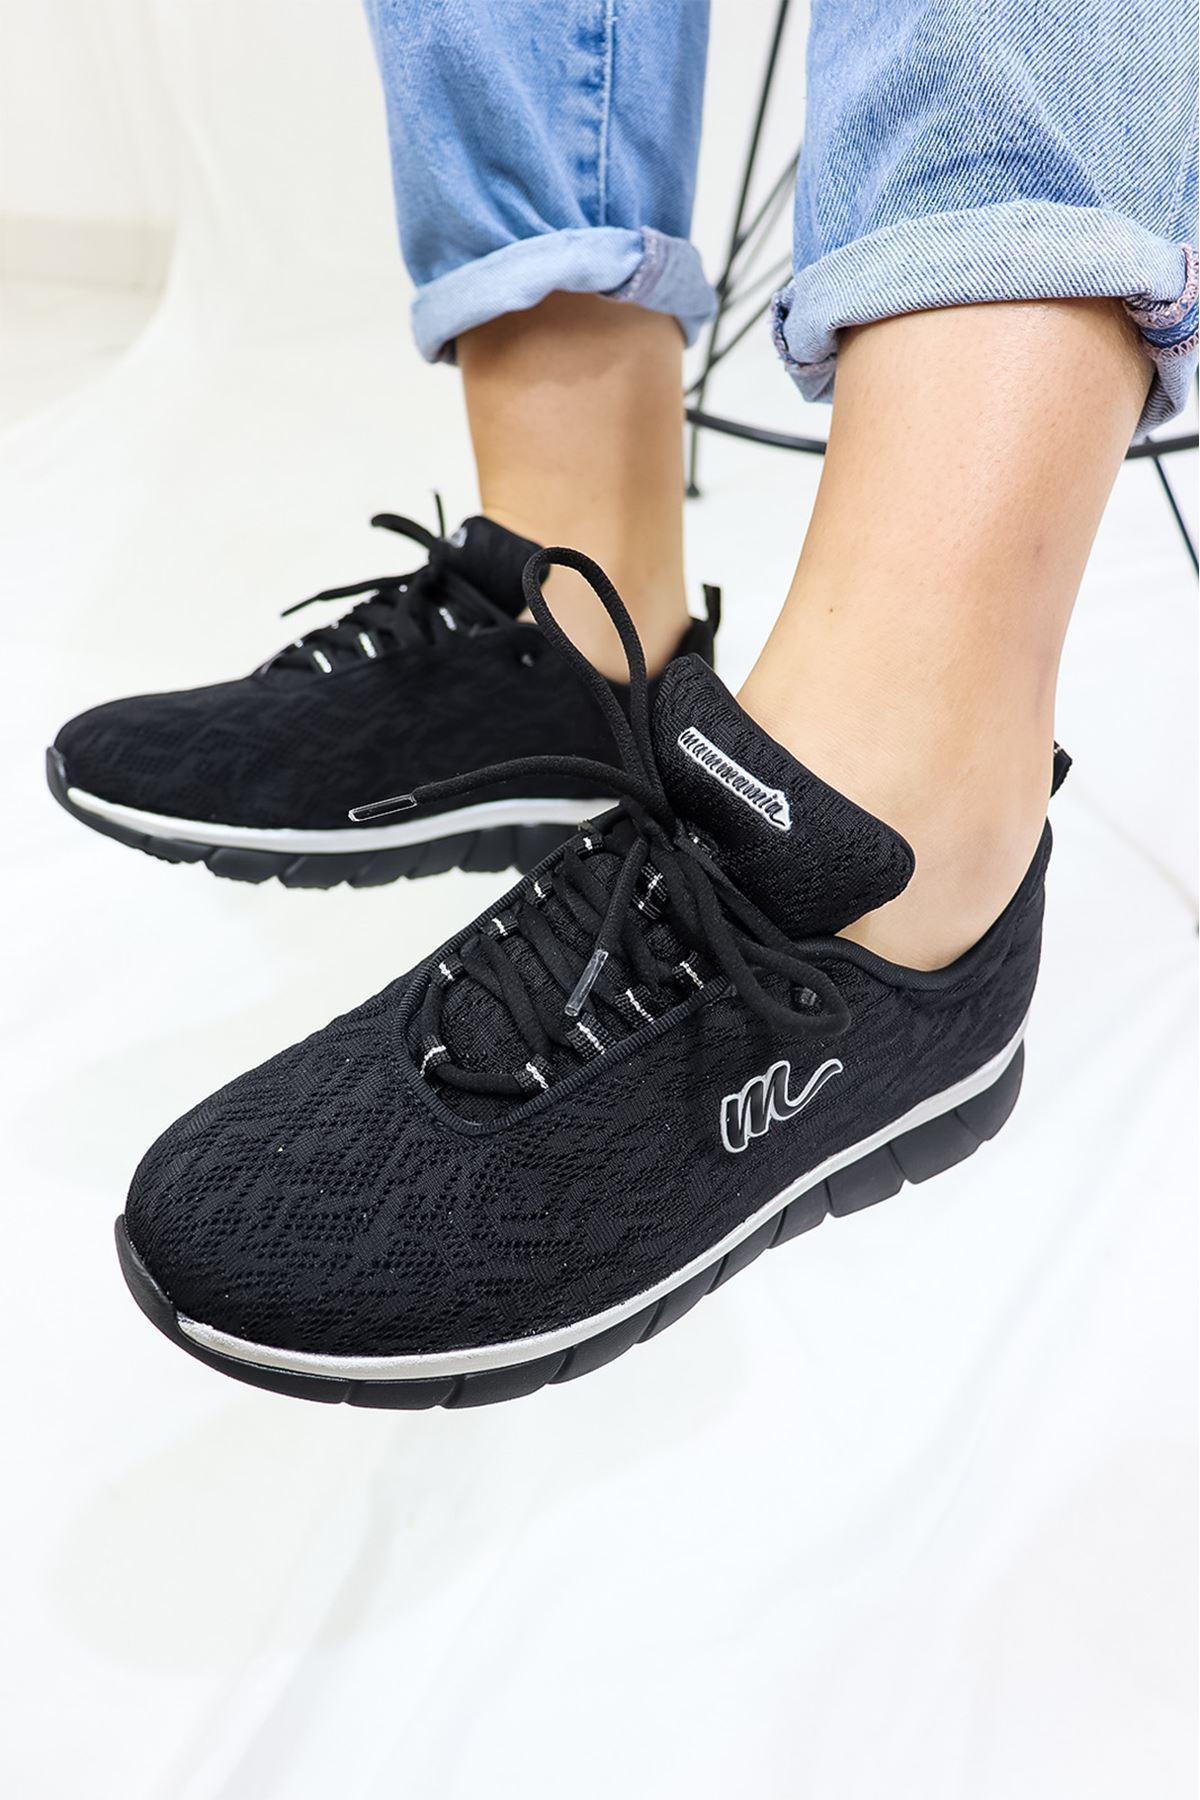 Mammamia - D21YA - 660-B Siyah Spor Kadın Ayakkabısı